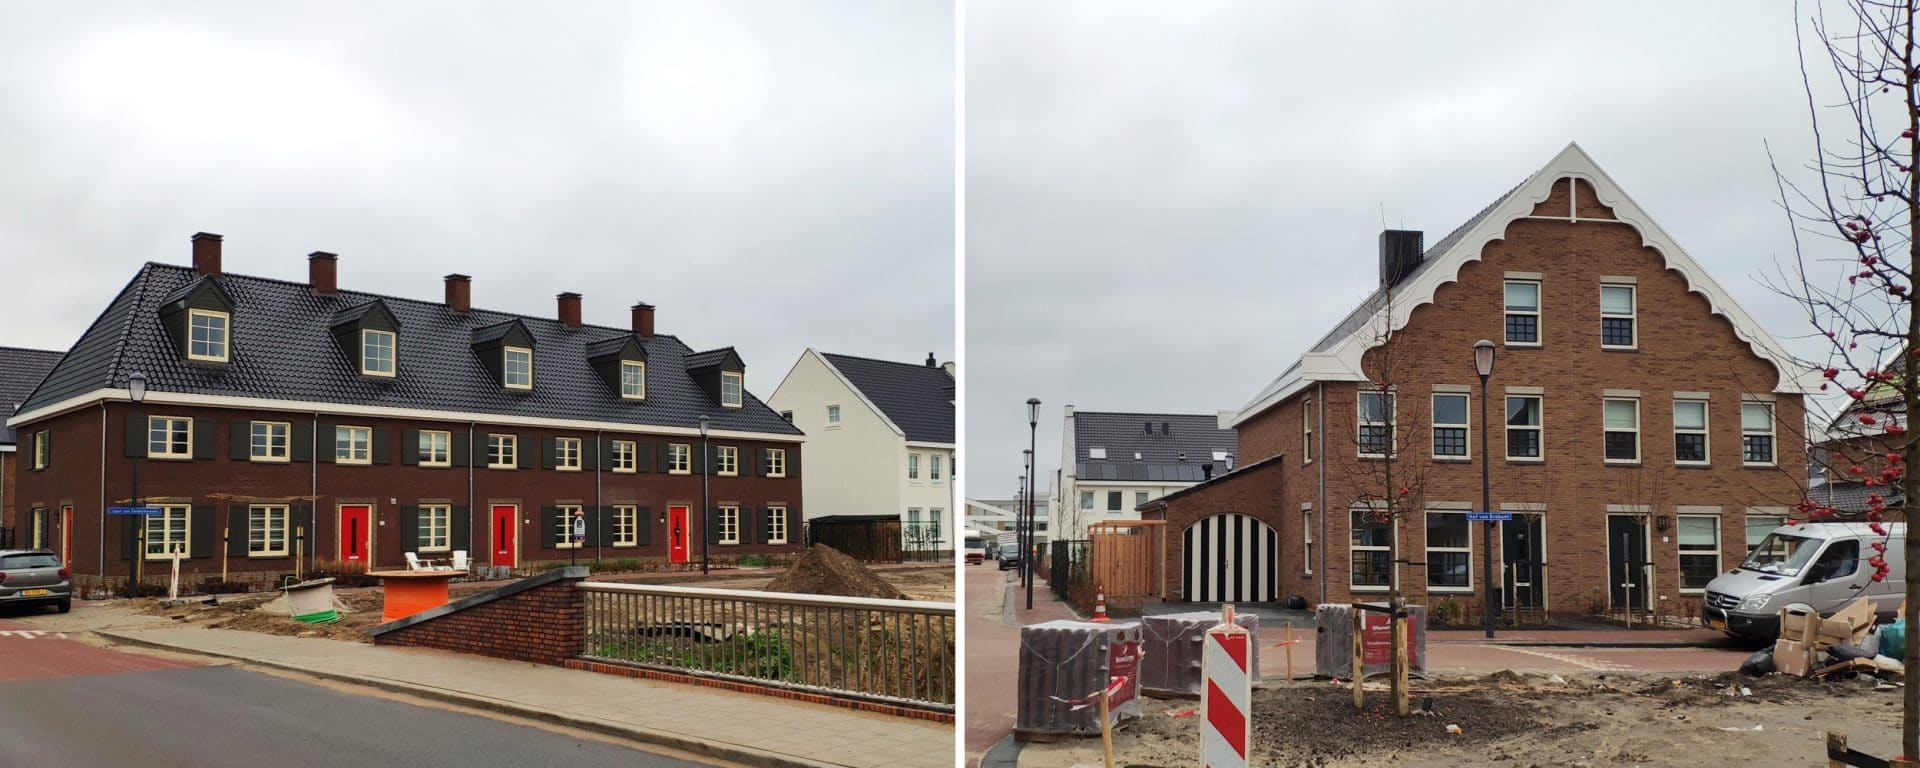 Project ZuiderHoeven in Hoofddorp